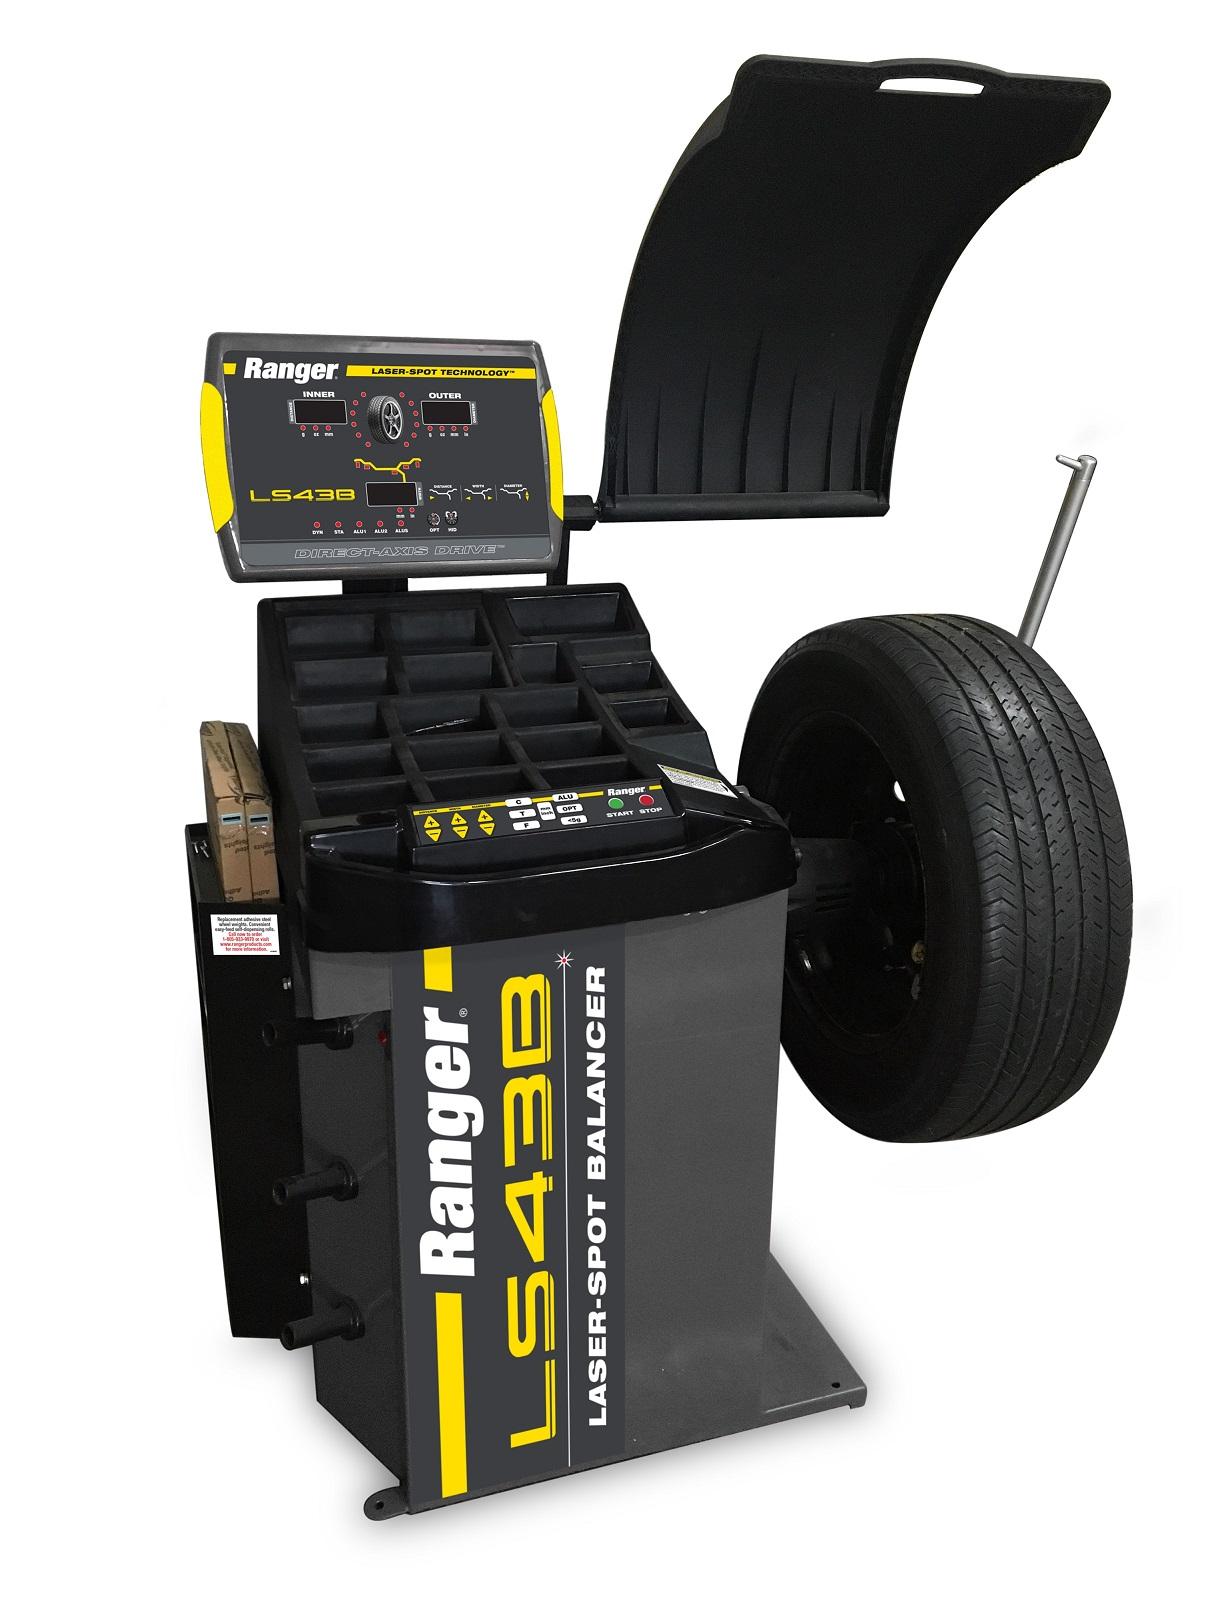 Ranger Balancer Pinpoints Wheel Weight Locations